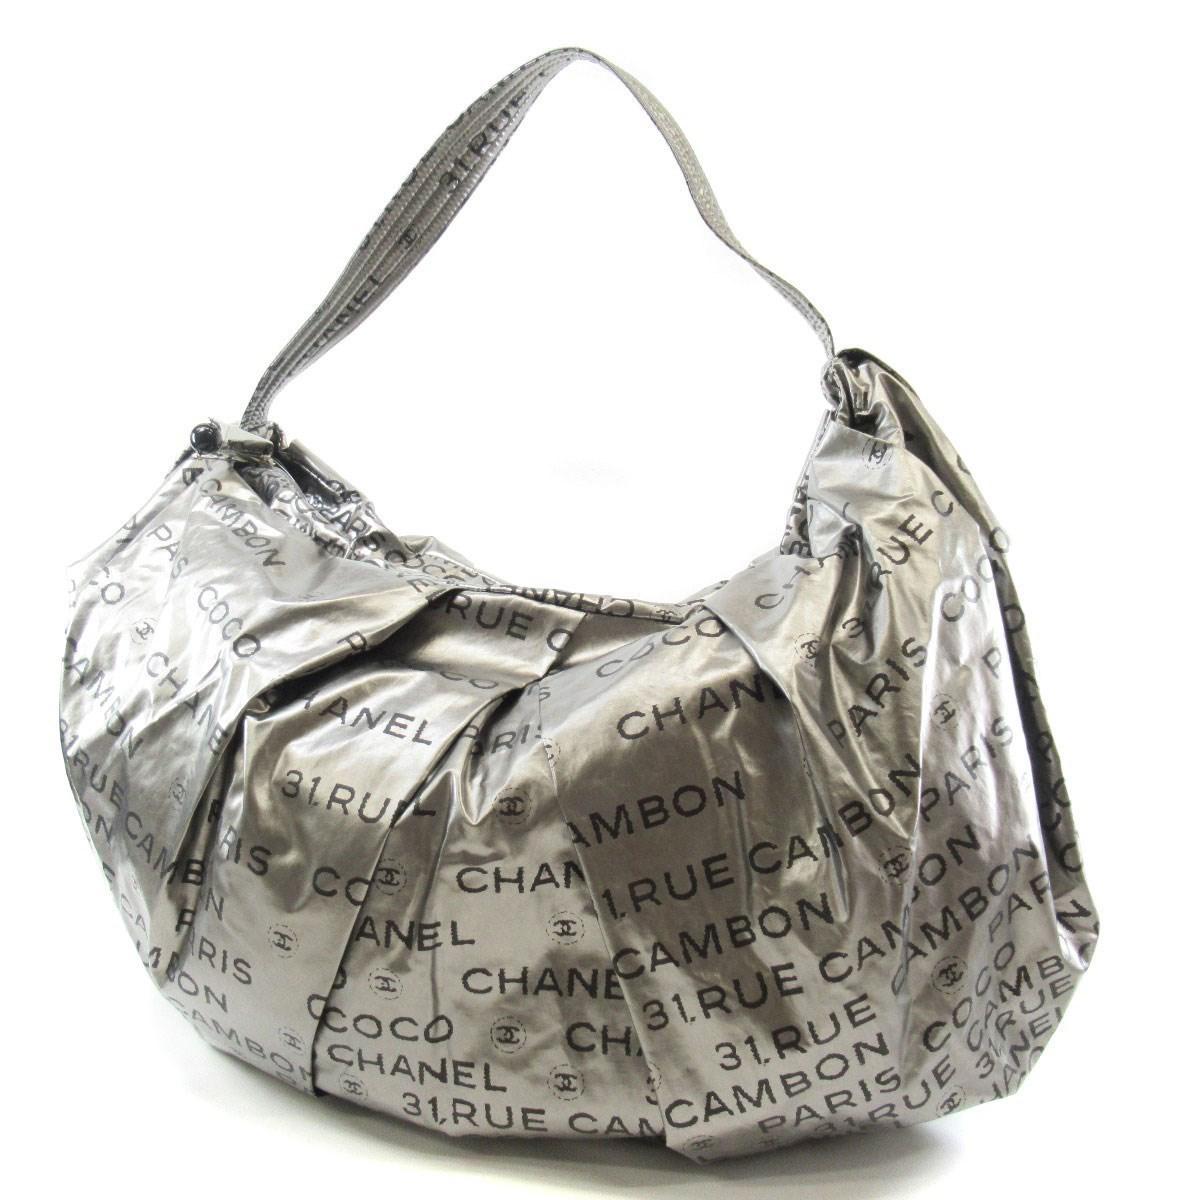 5b4721575851 Lyst - Chanel Nylon Shoulder Bag Unlimited in Metallic